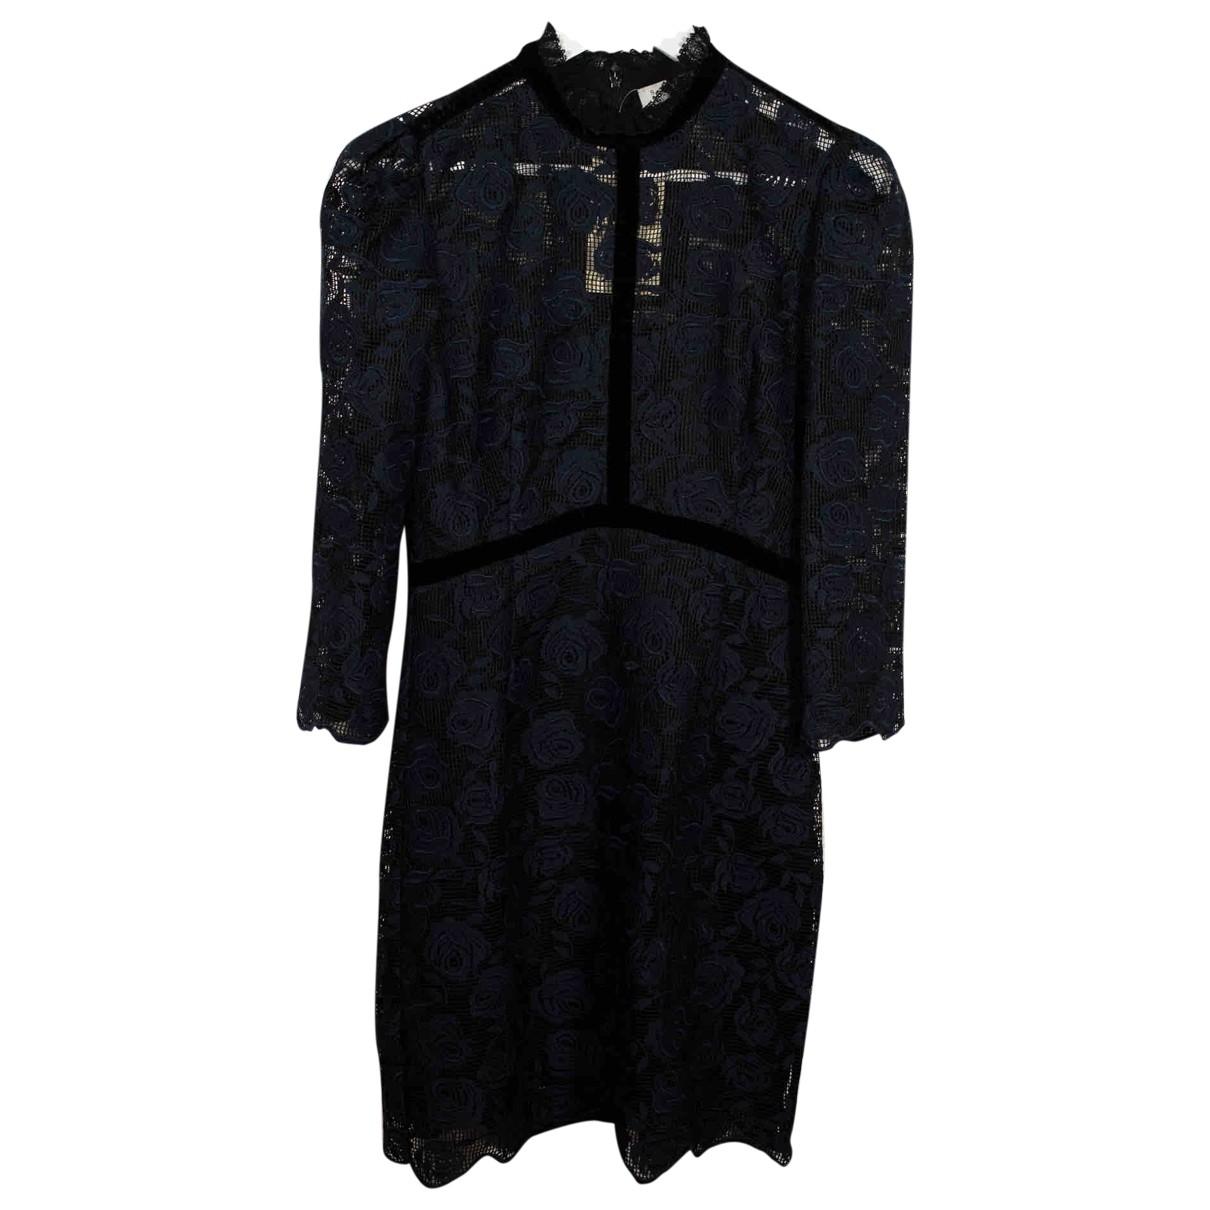 Sandro Spring Summer 2019 Blue Lace dress for Women 36 FR